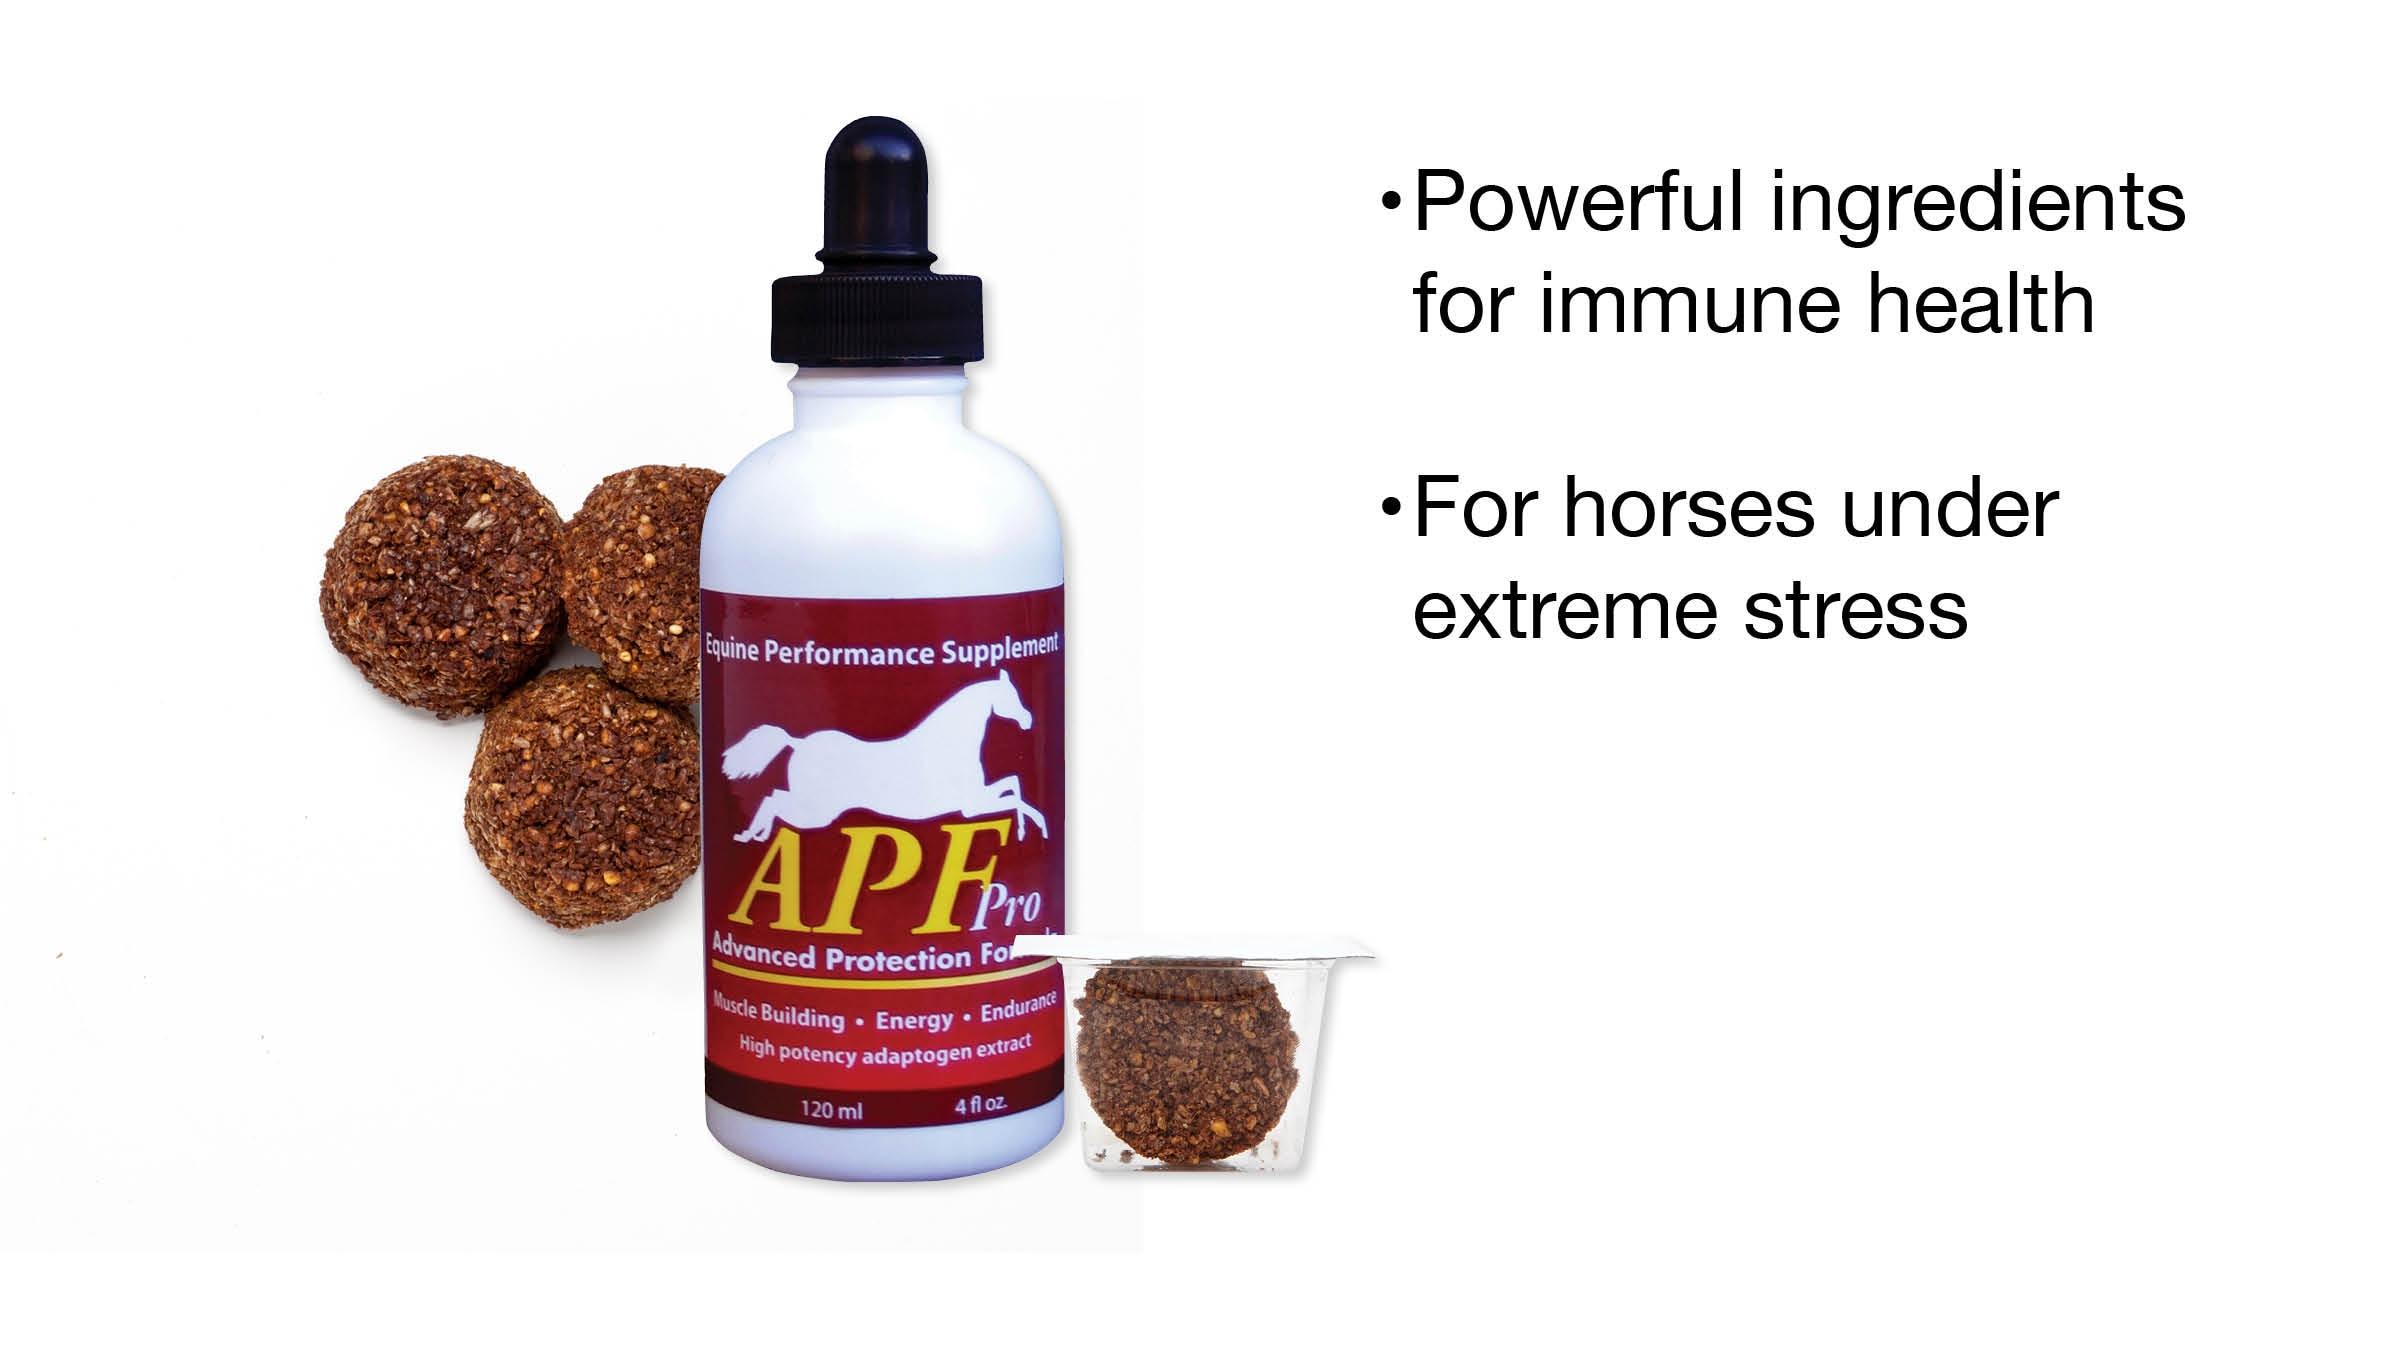 120 Ml Bottle Auburn Laboratories Apf Pro Equine Business & Industrial Animal Health & Veterinary